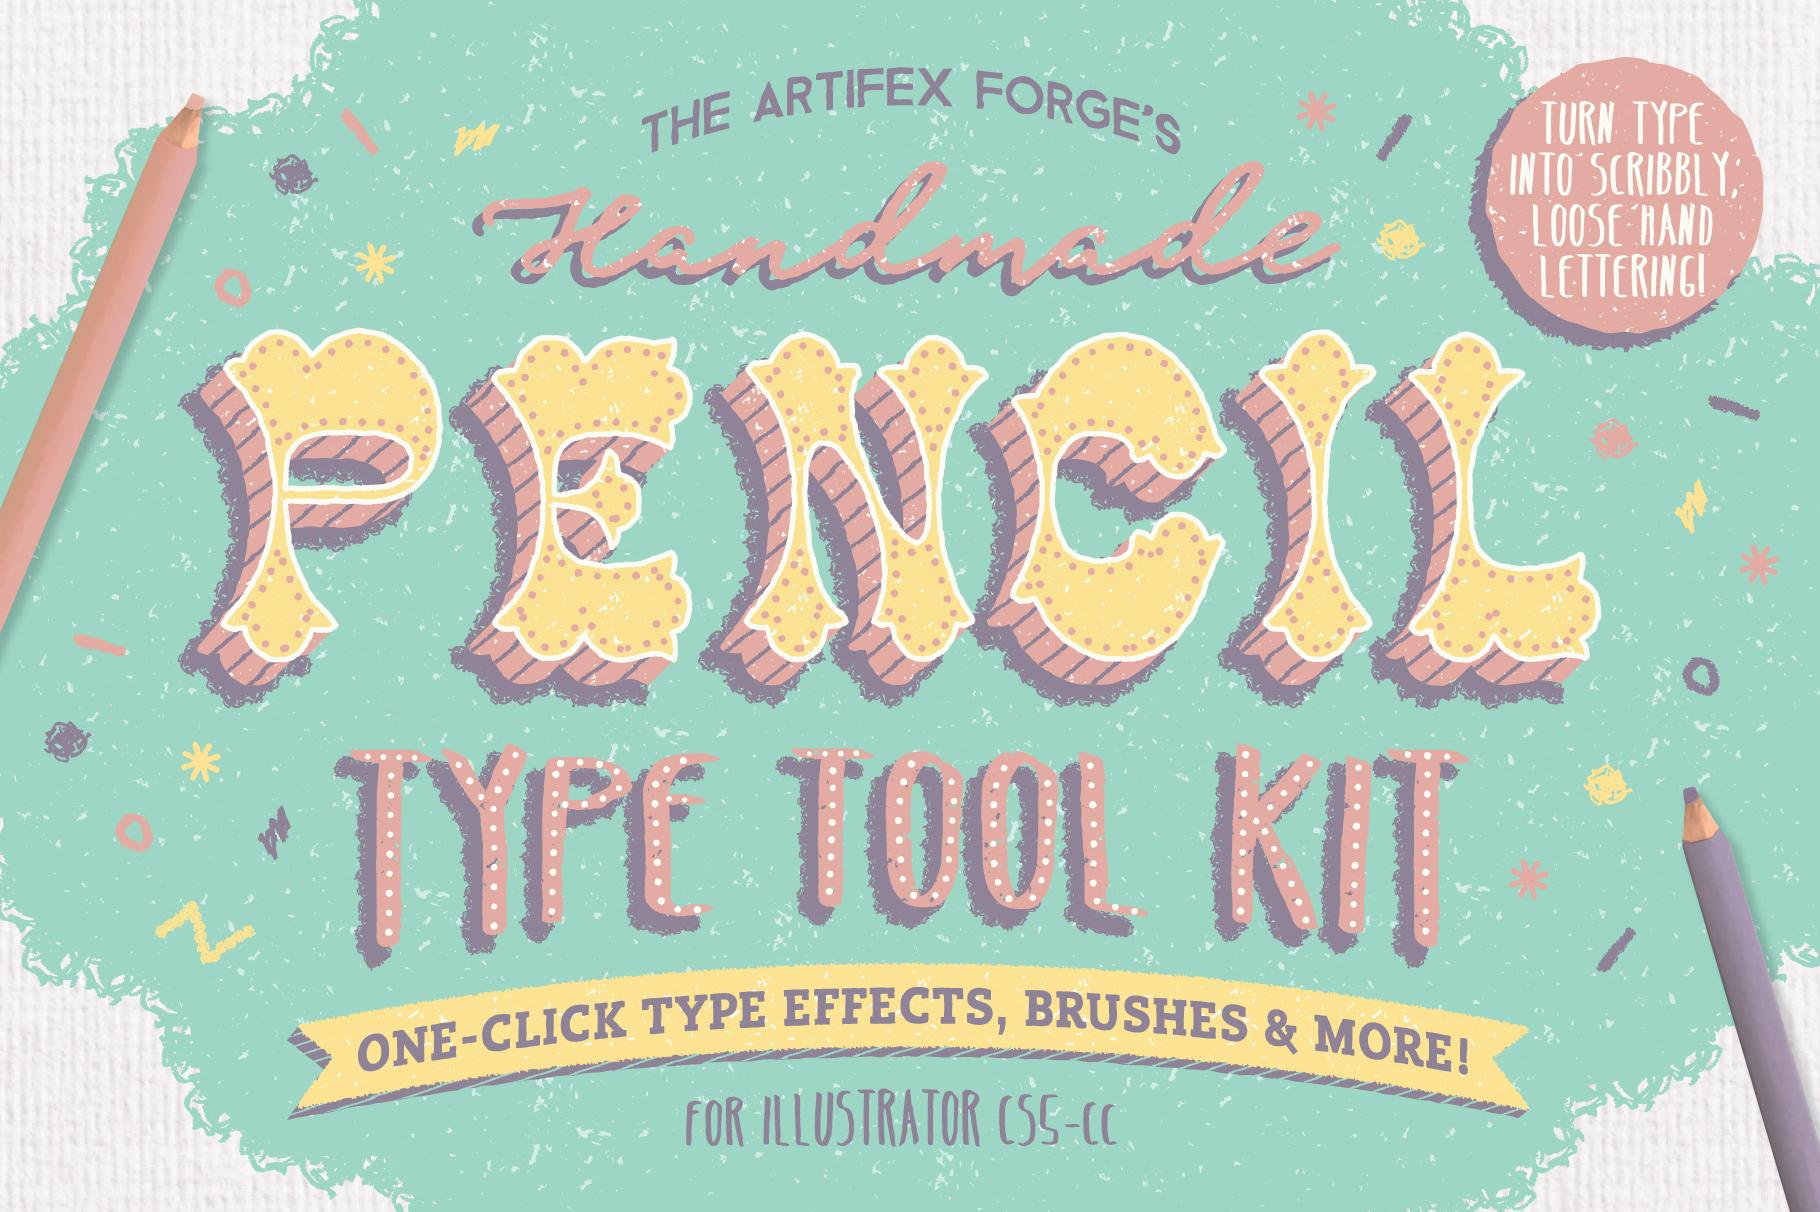 Hand-drawn-Pencil-Type-Tool-Kit_0